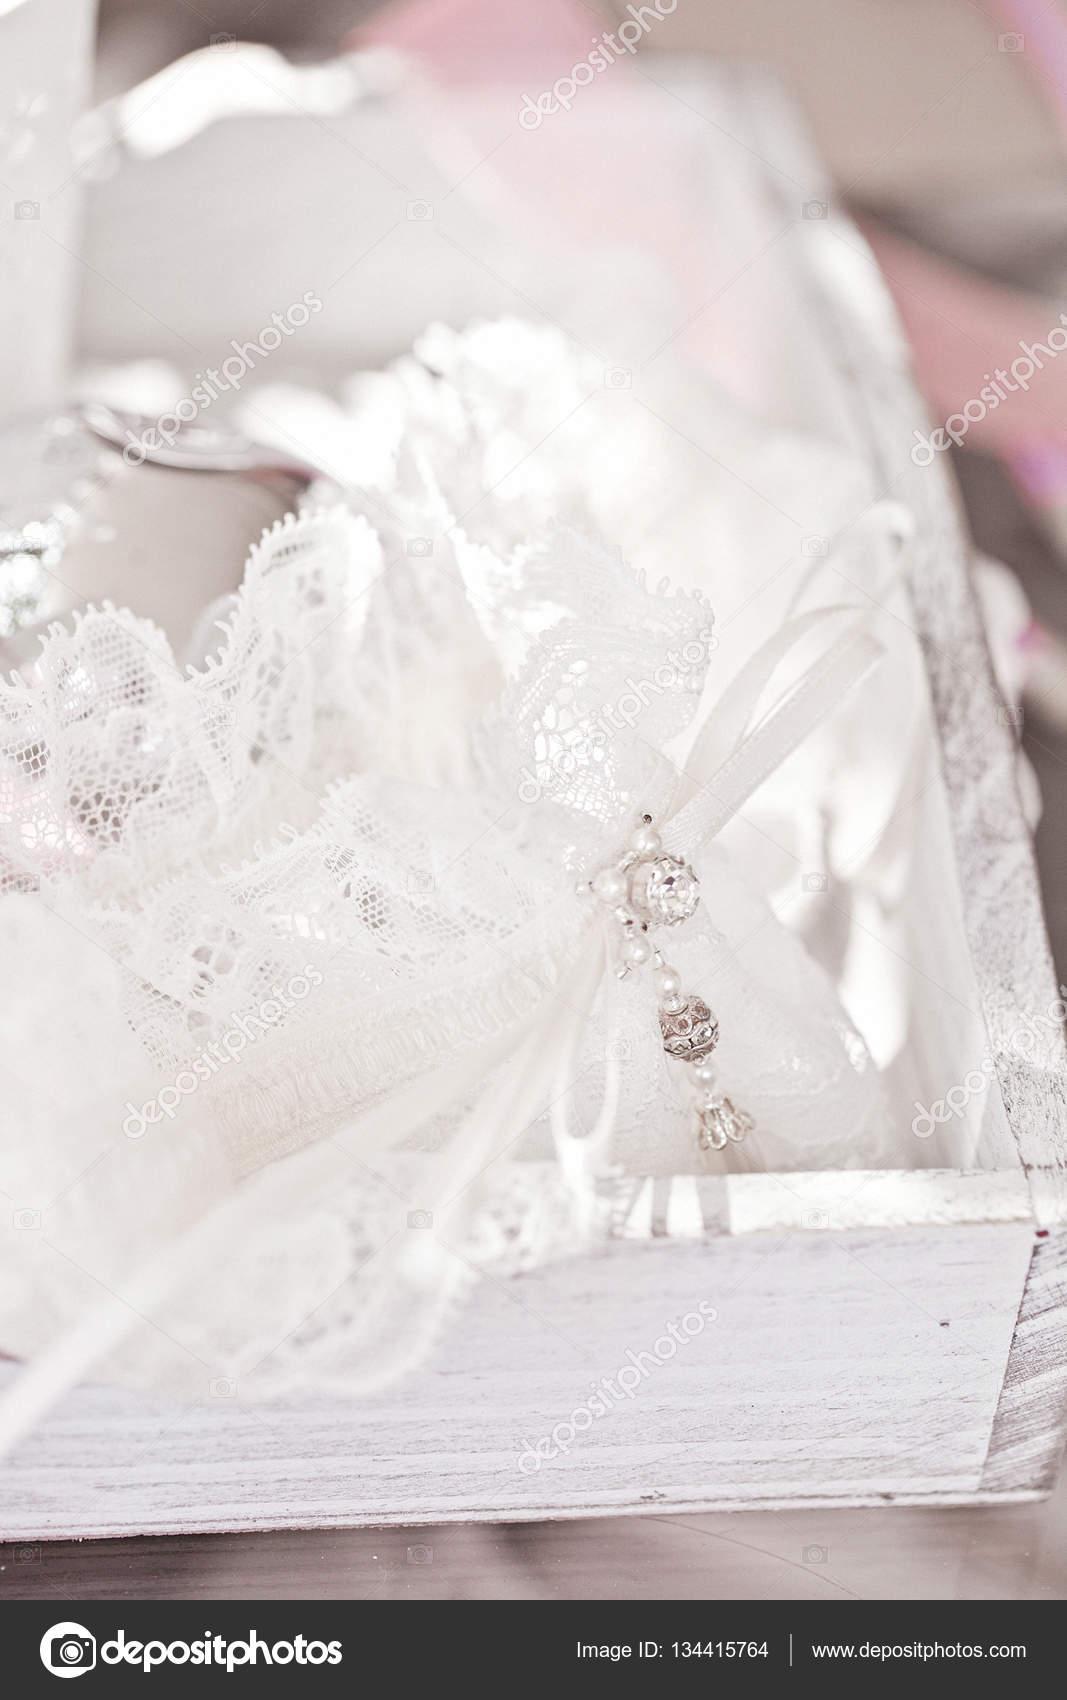 69d8f9daa3 Η σύνθεση της όμορφο γάμο αξεσουάρ νύφης — Φωτογραφία Αρχείου ...